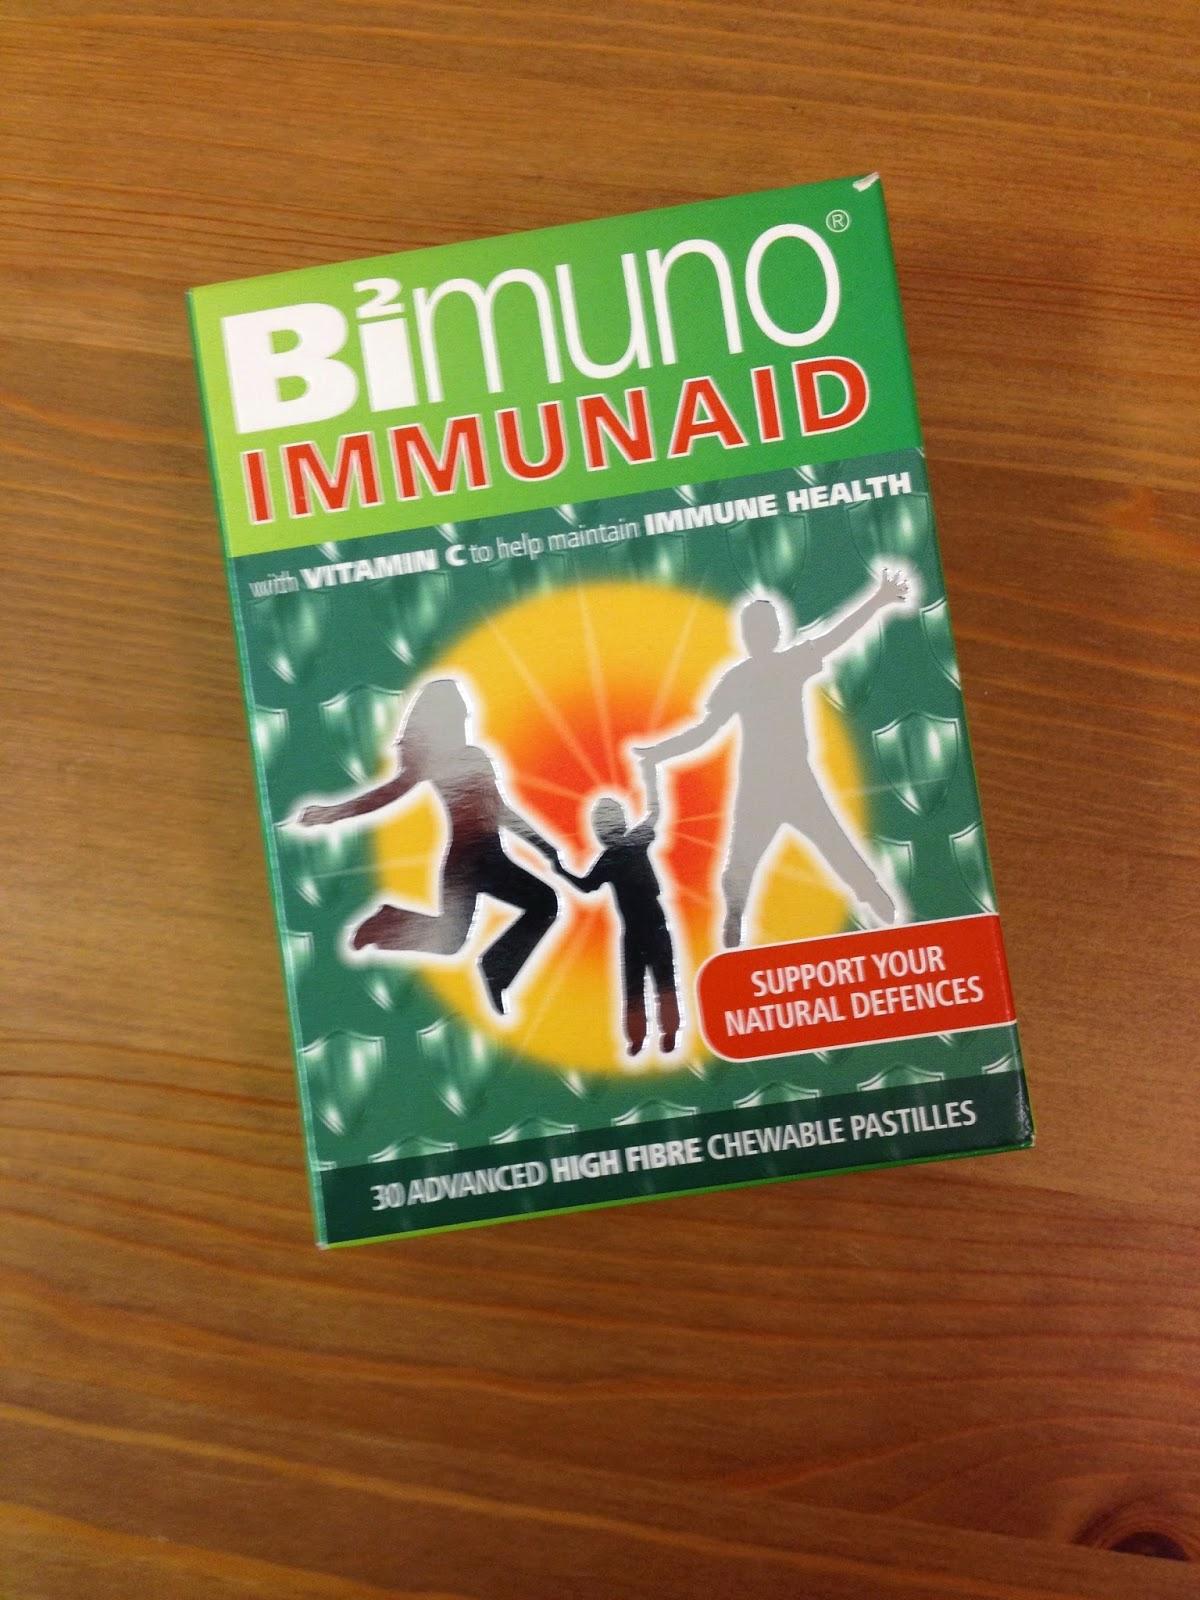 Review & Giveaway – Bimuno Immunaid Chewable Pastilles